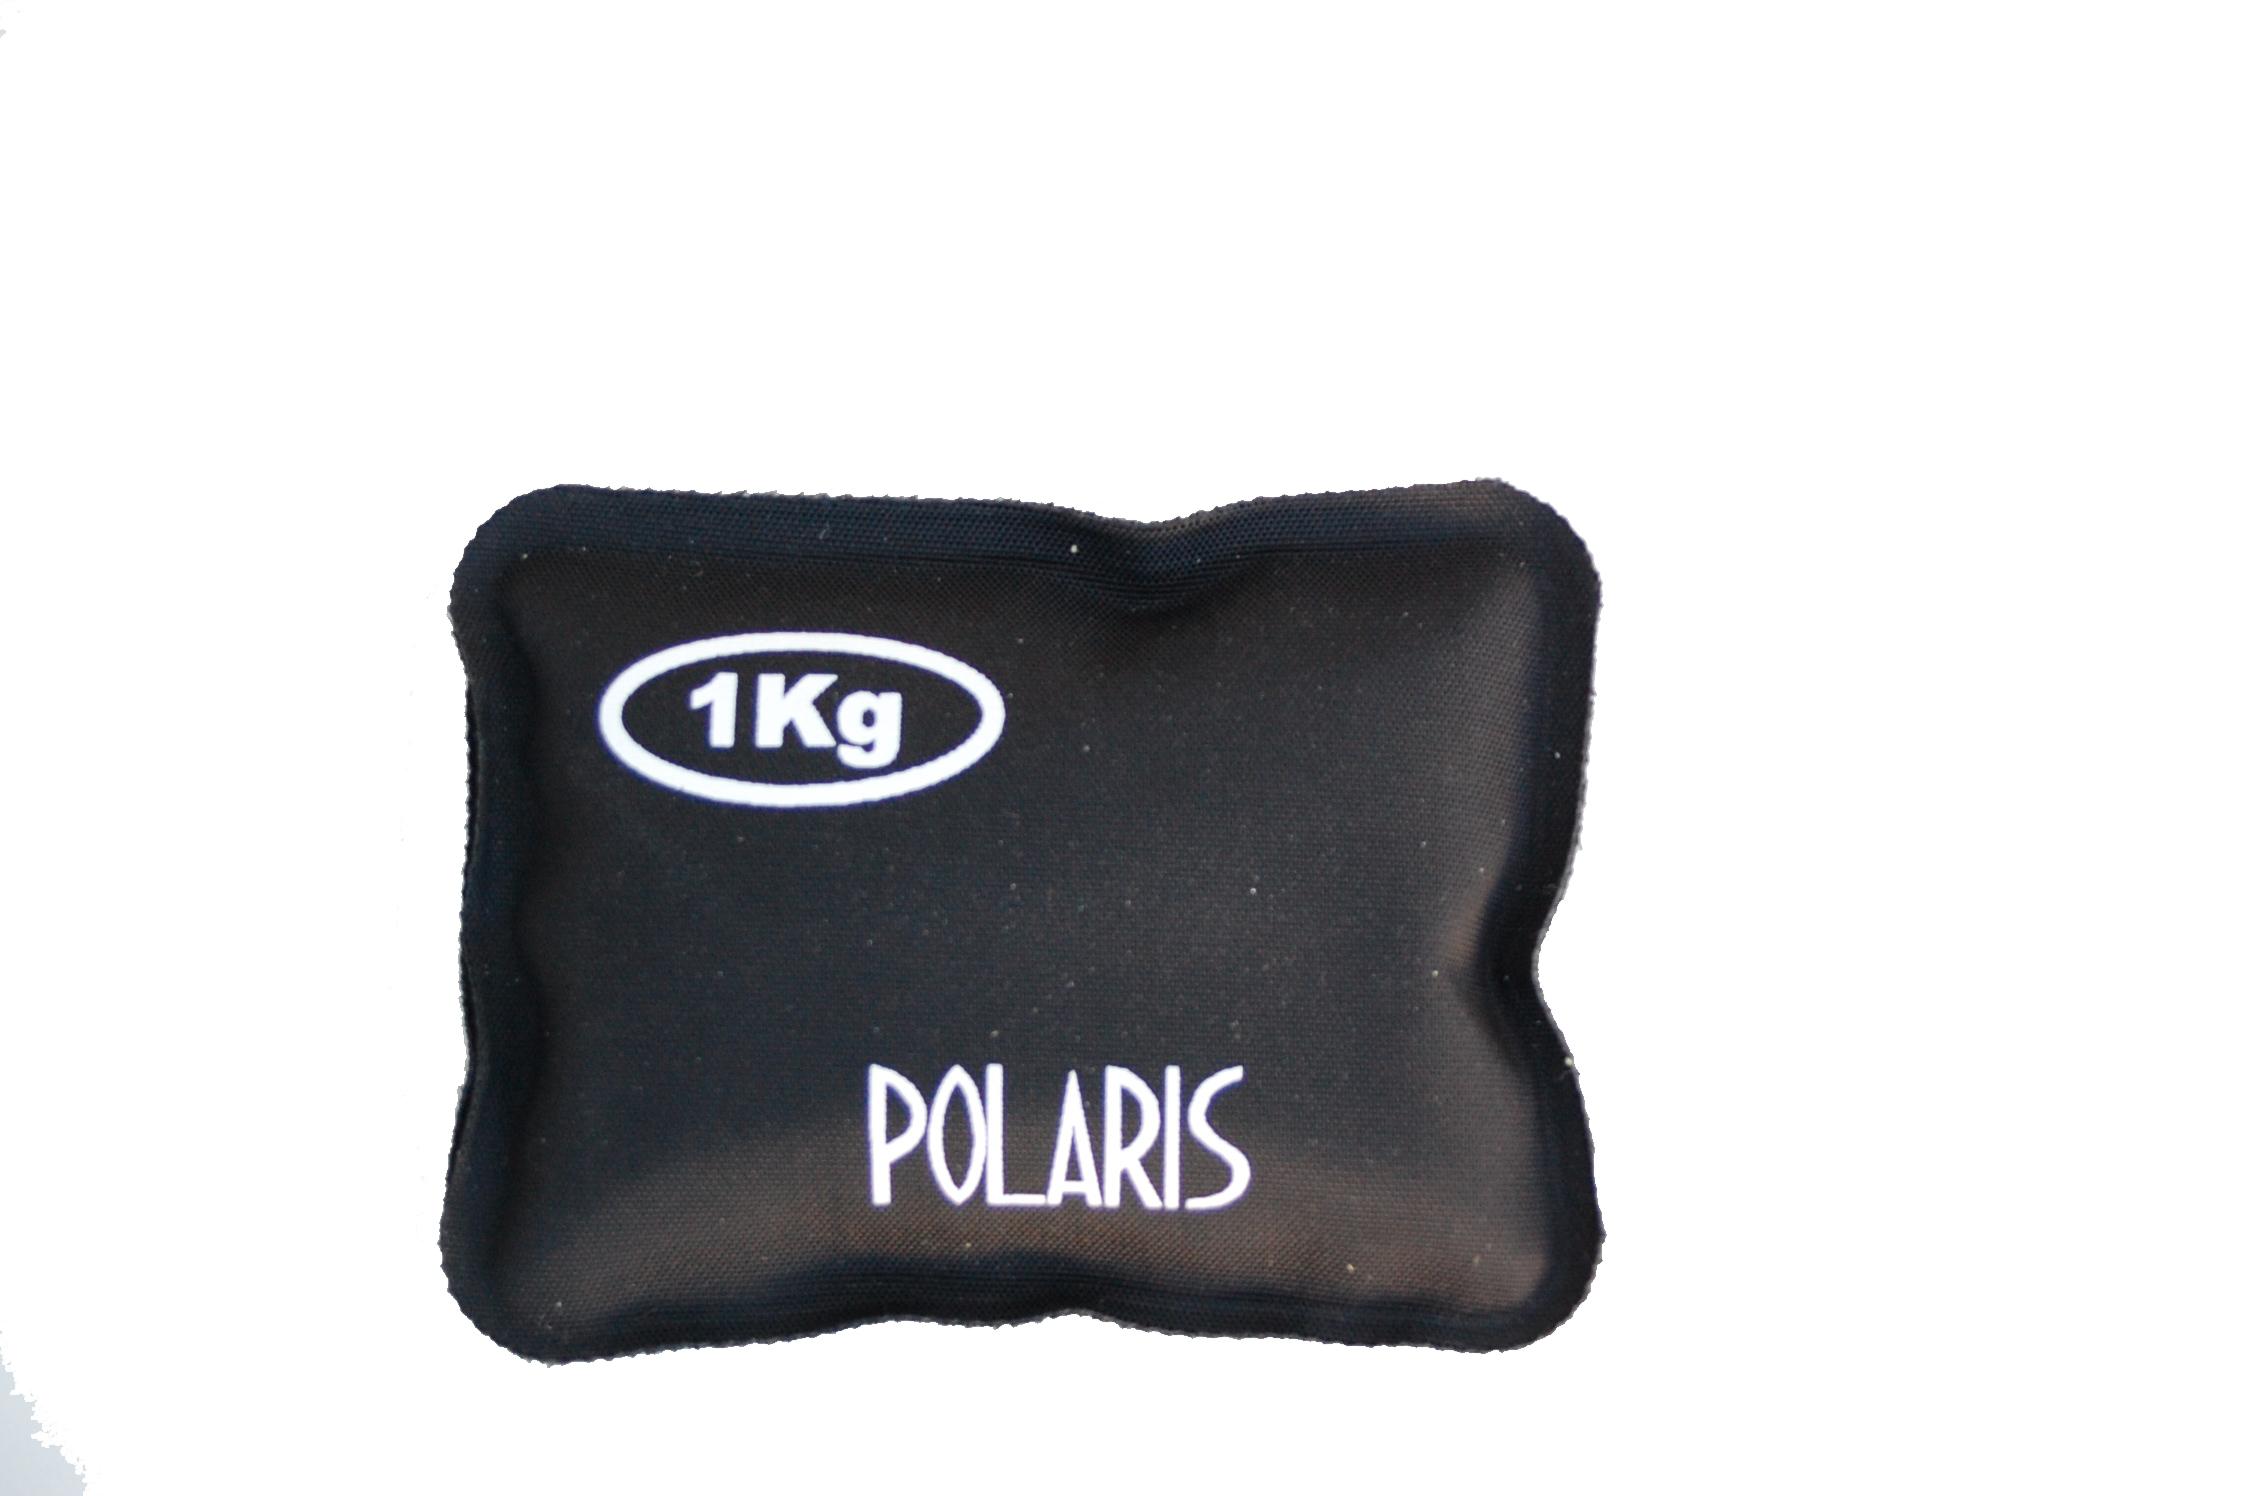 Polaris Zátěž Broky Hmotnost: 0,5 Kg